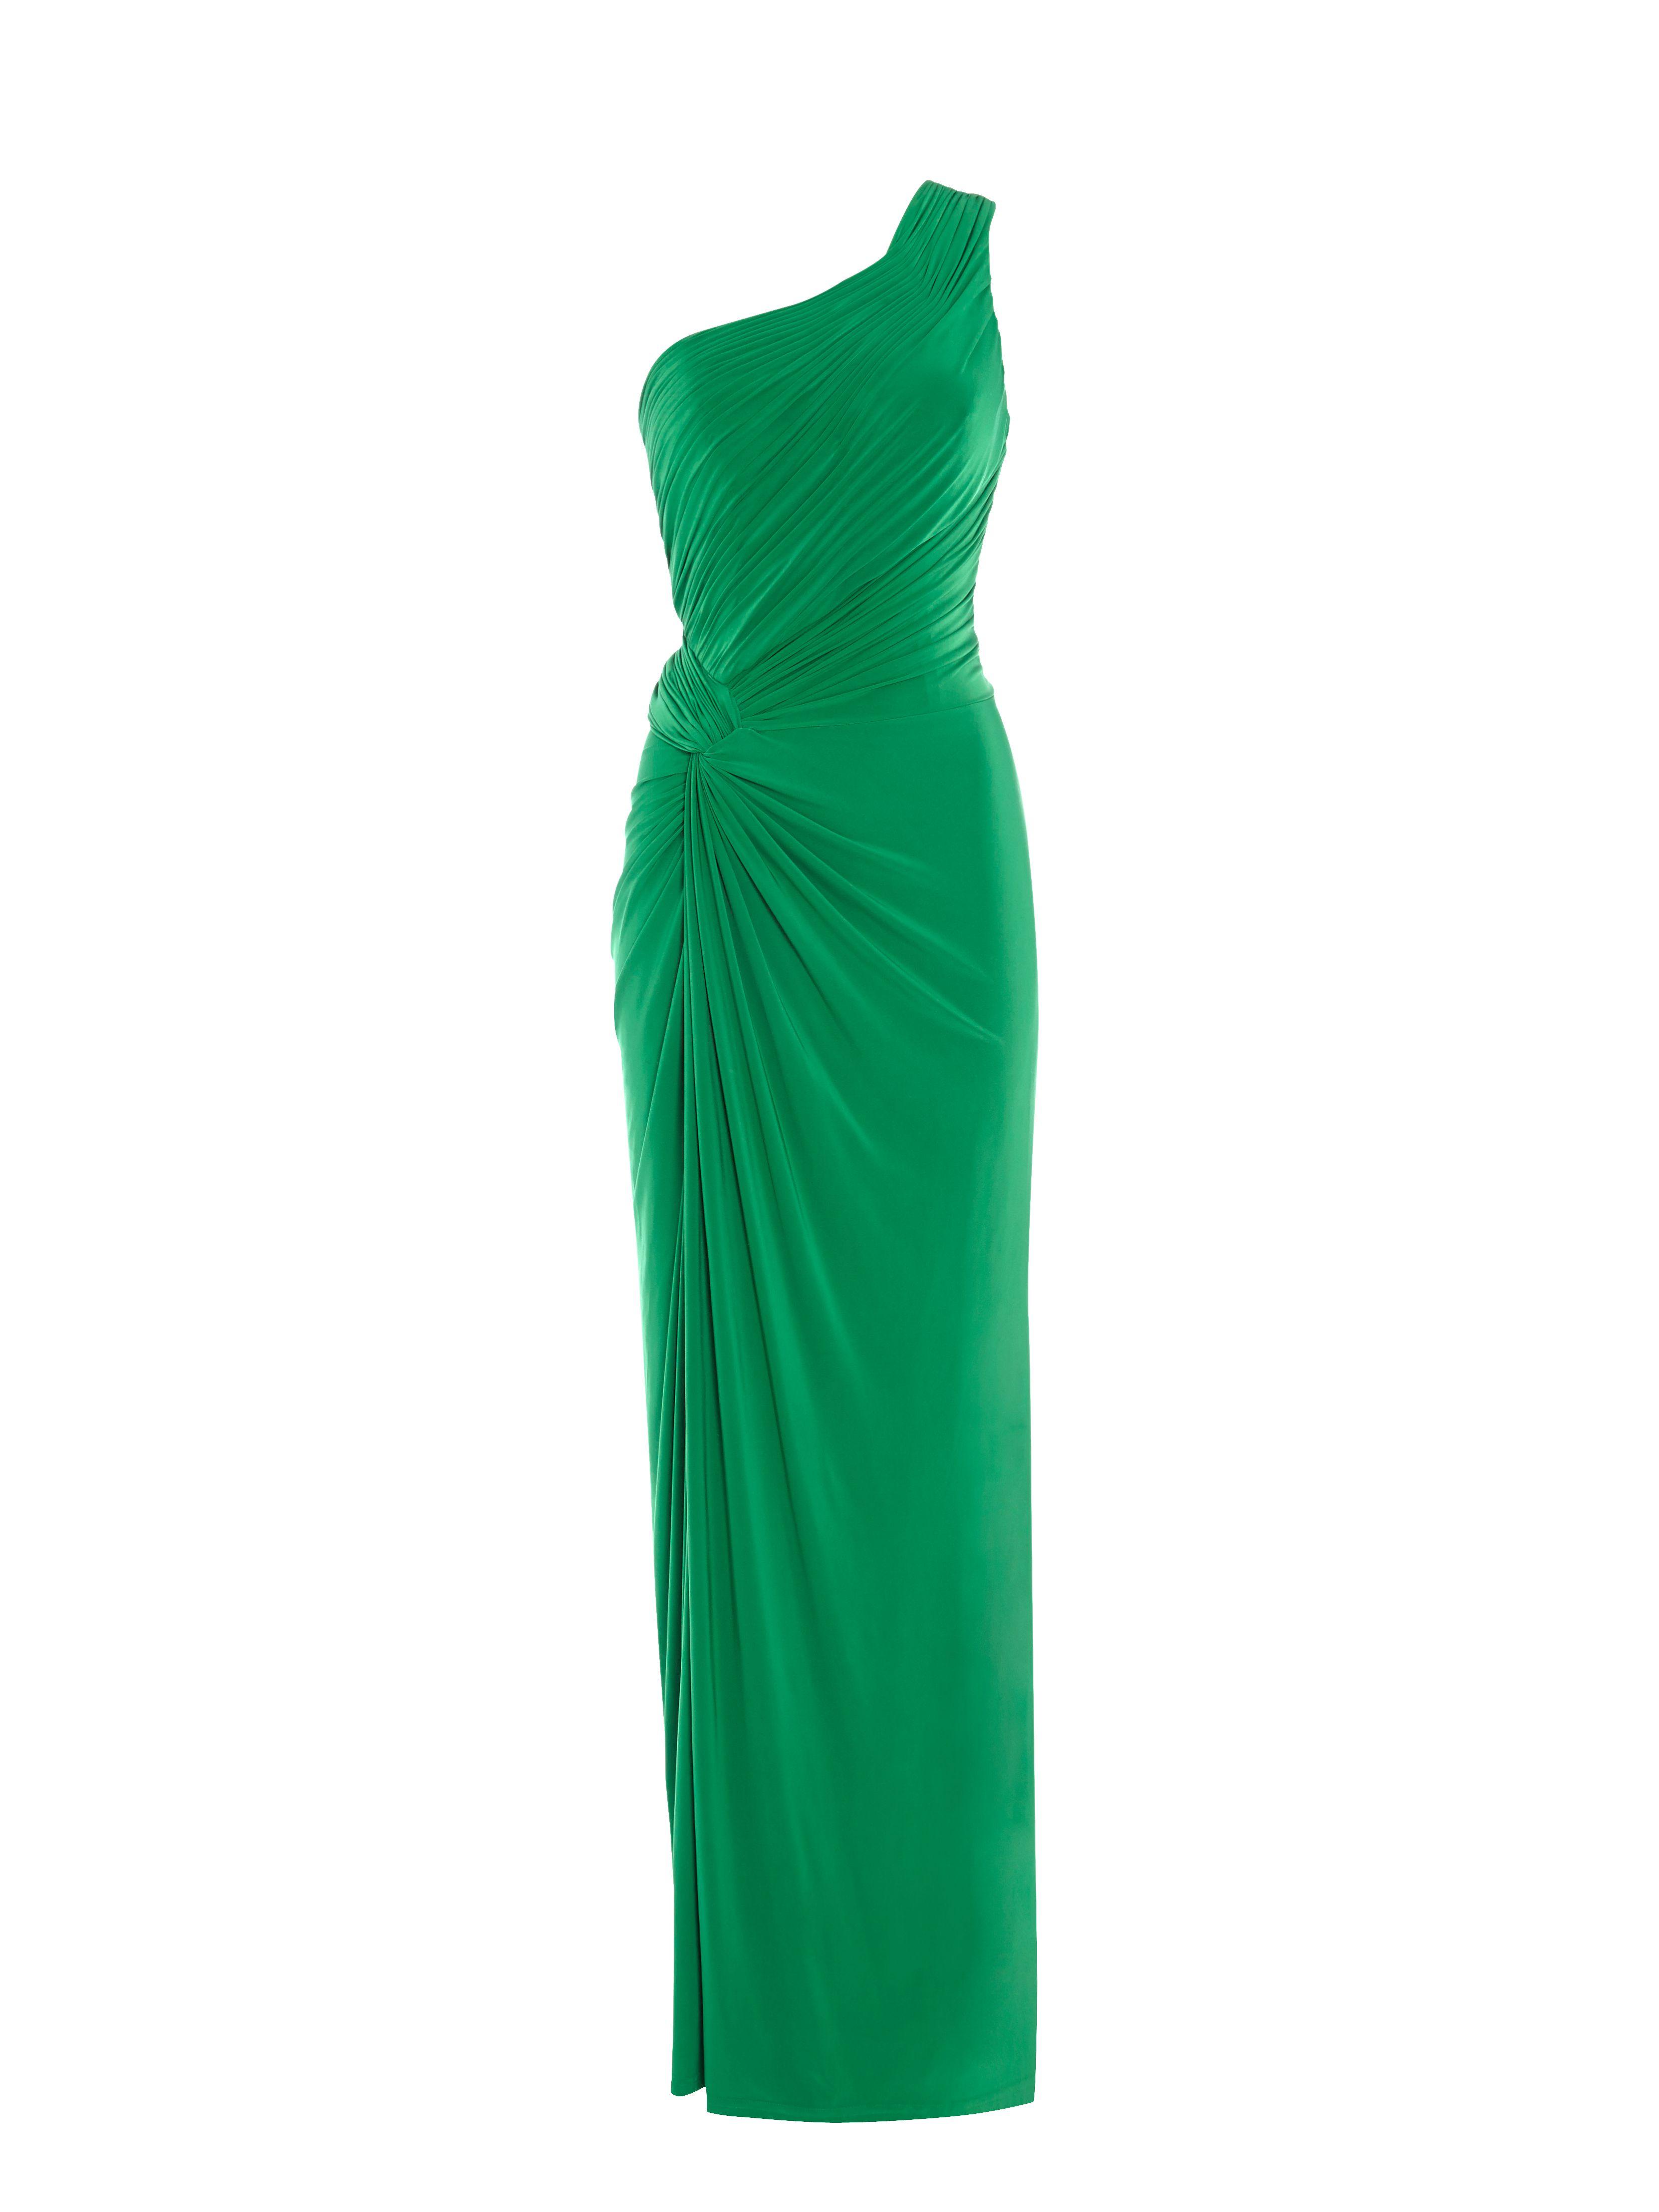 Emerald One Shoulder Jersey Dress